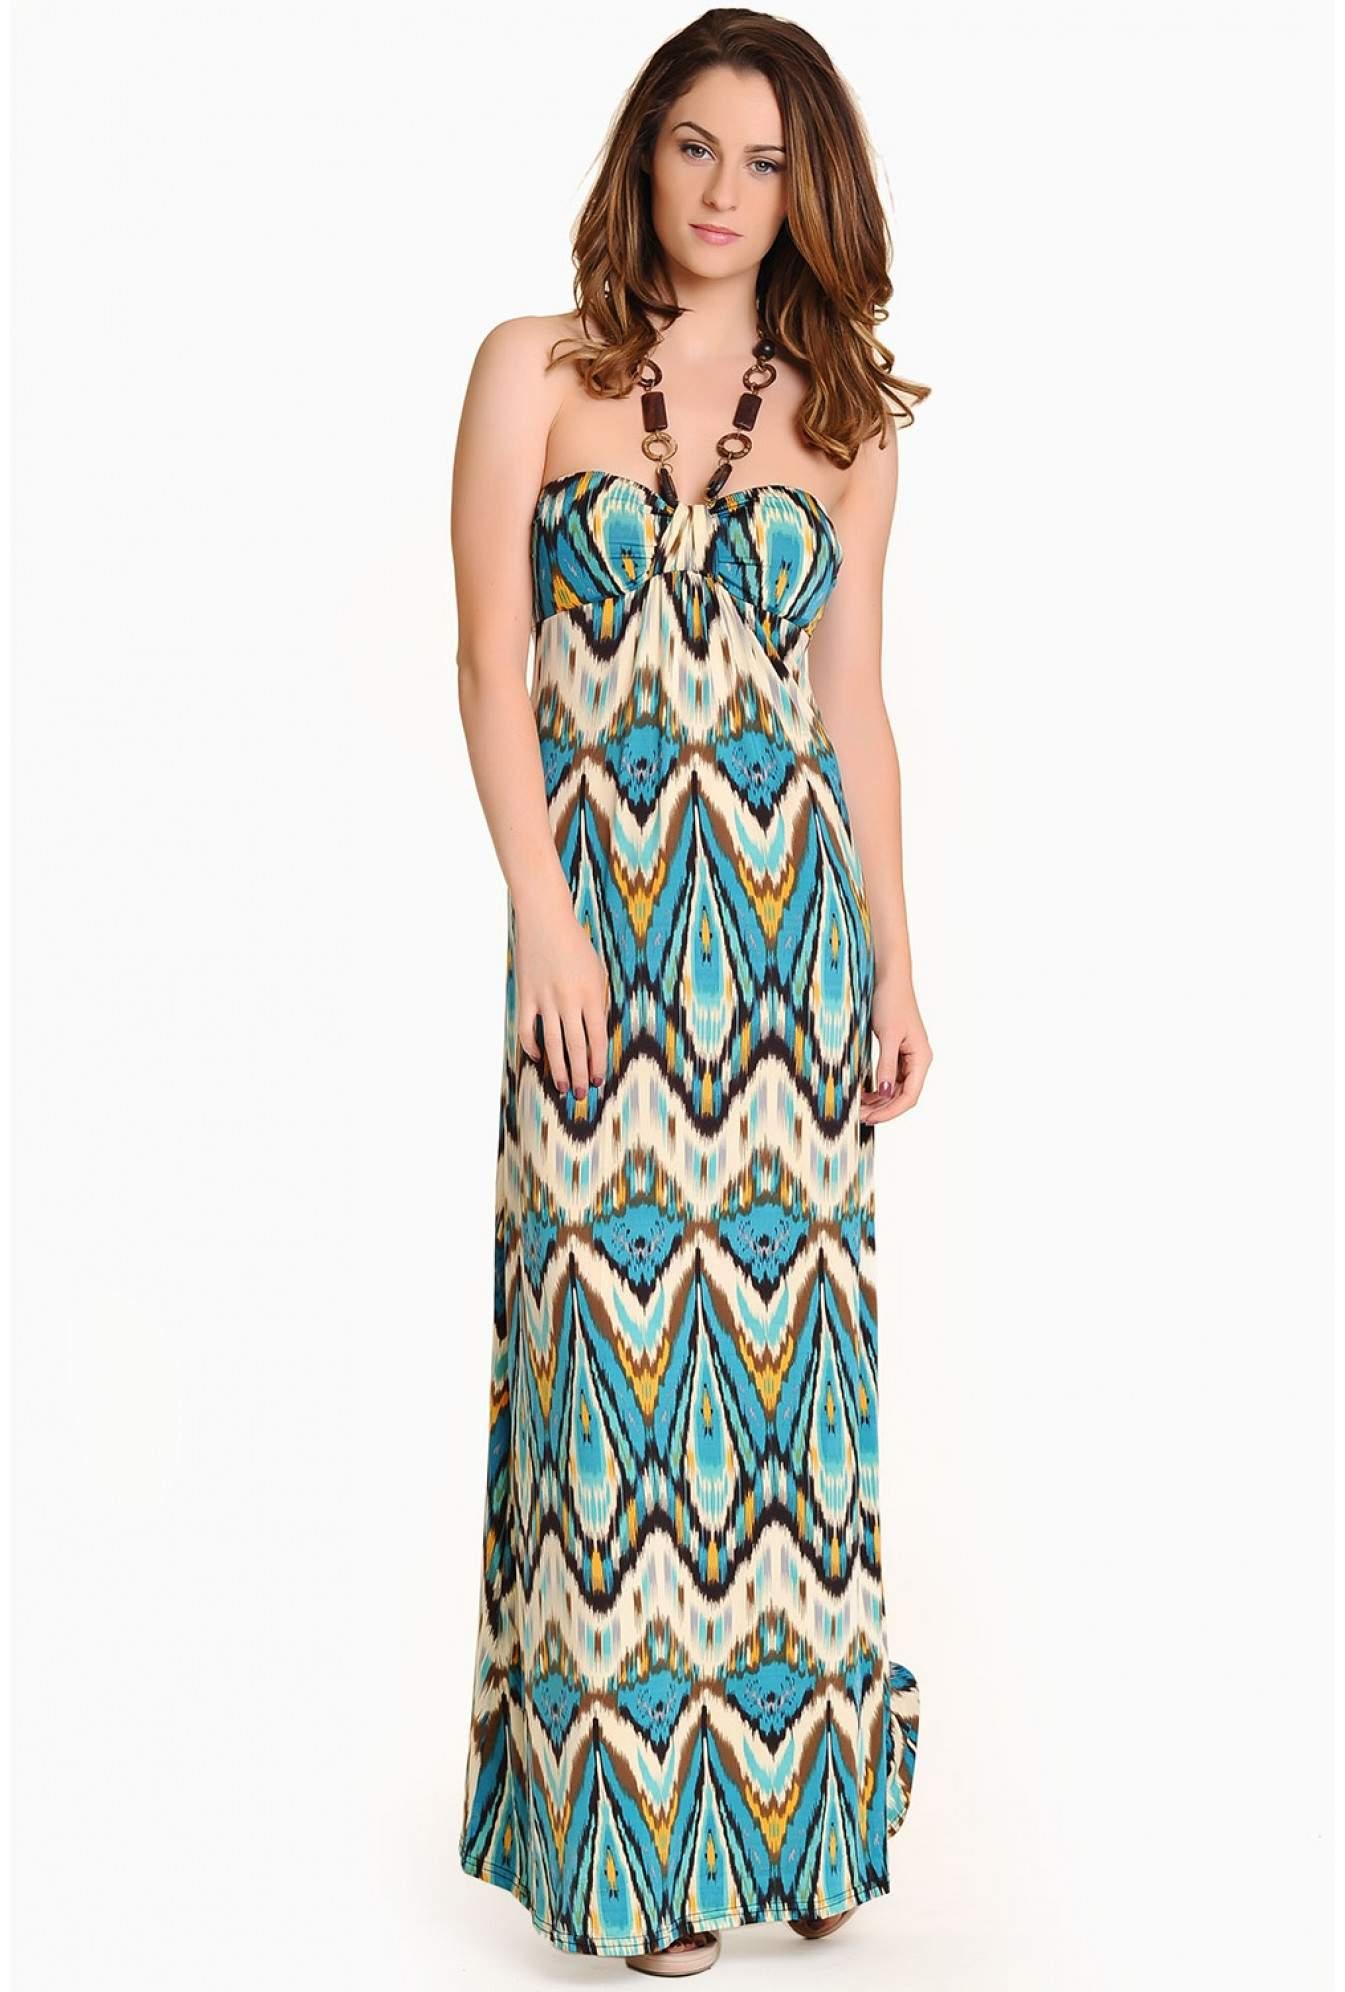 b9202374fd055 Stella Virginia Tribal Halter Neck Maxi Dress in Turquoise | iCLOTHING